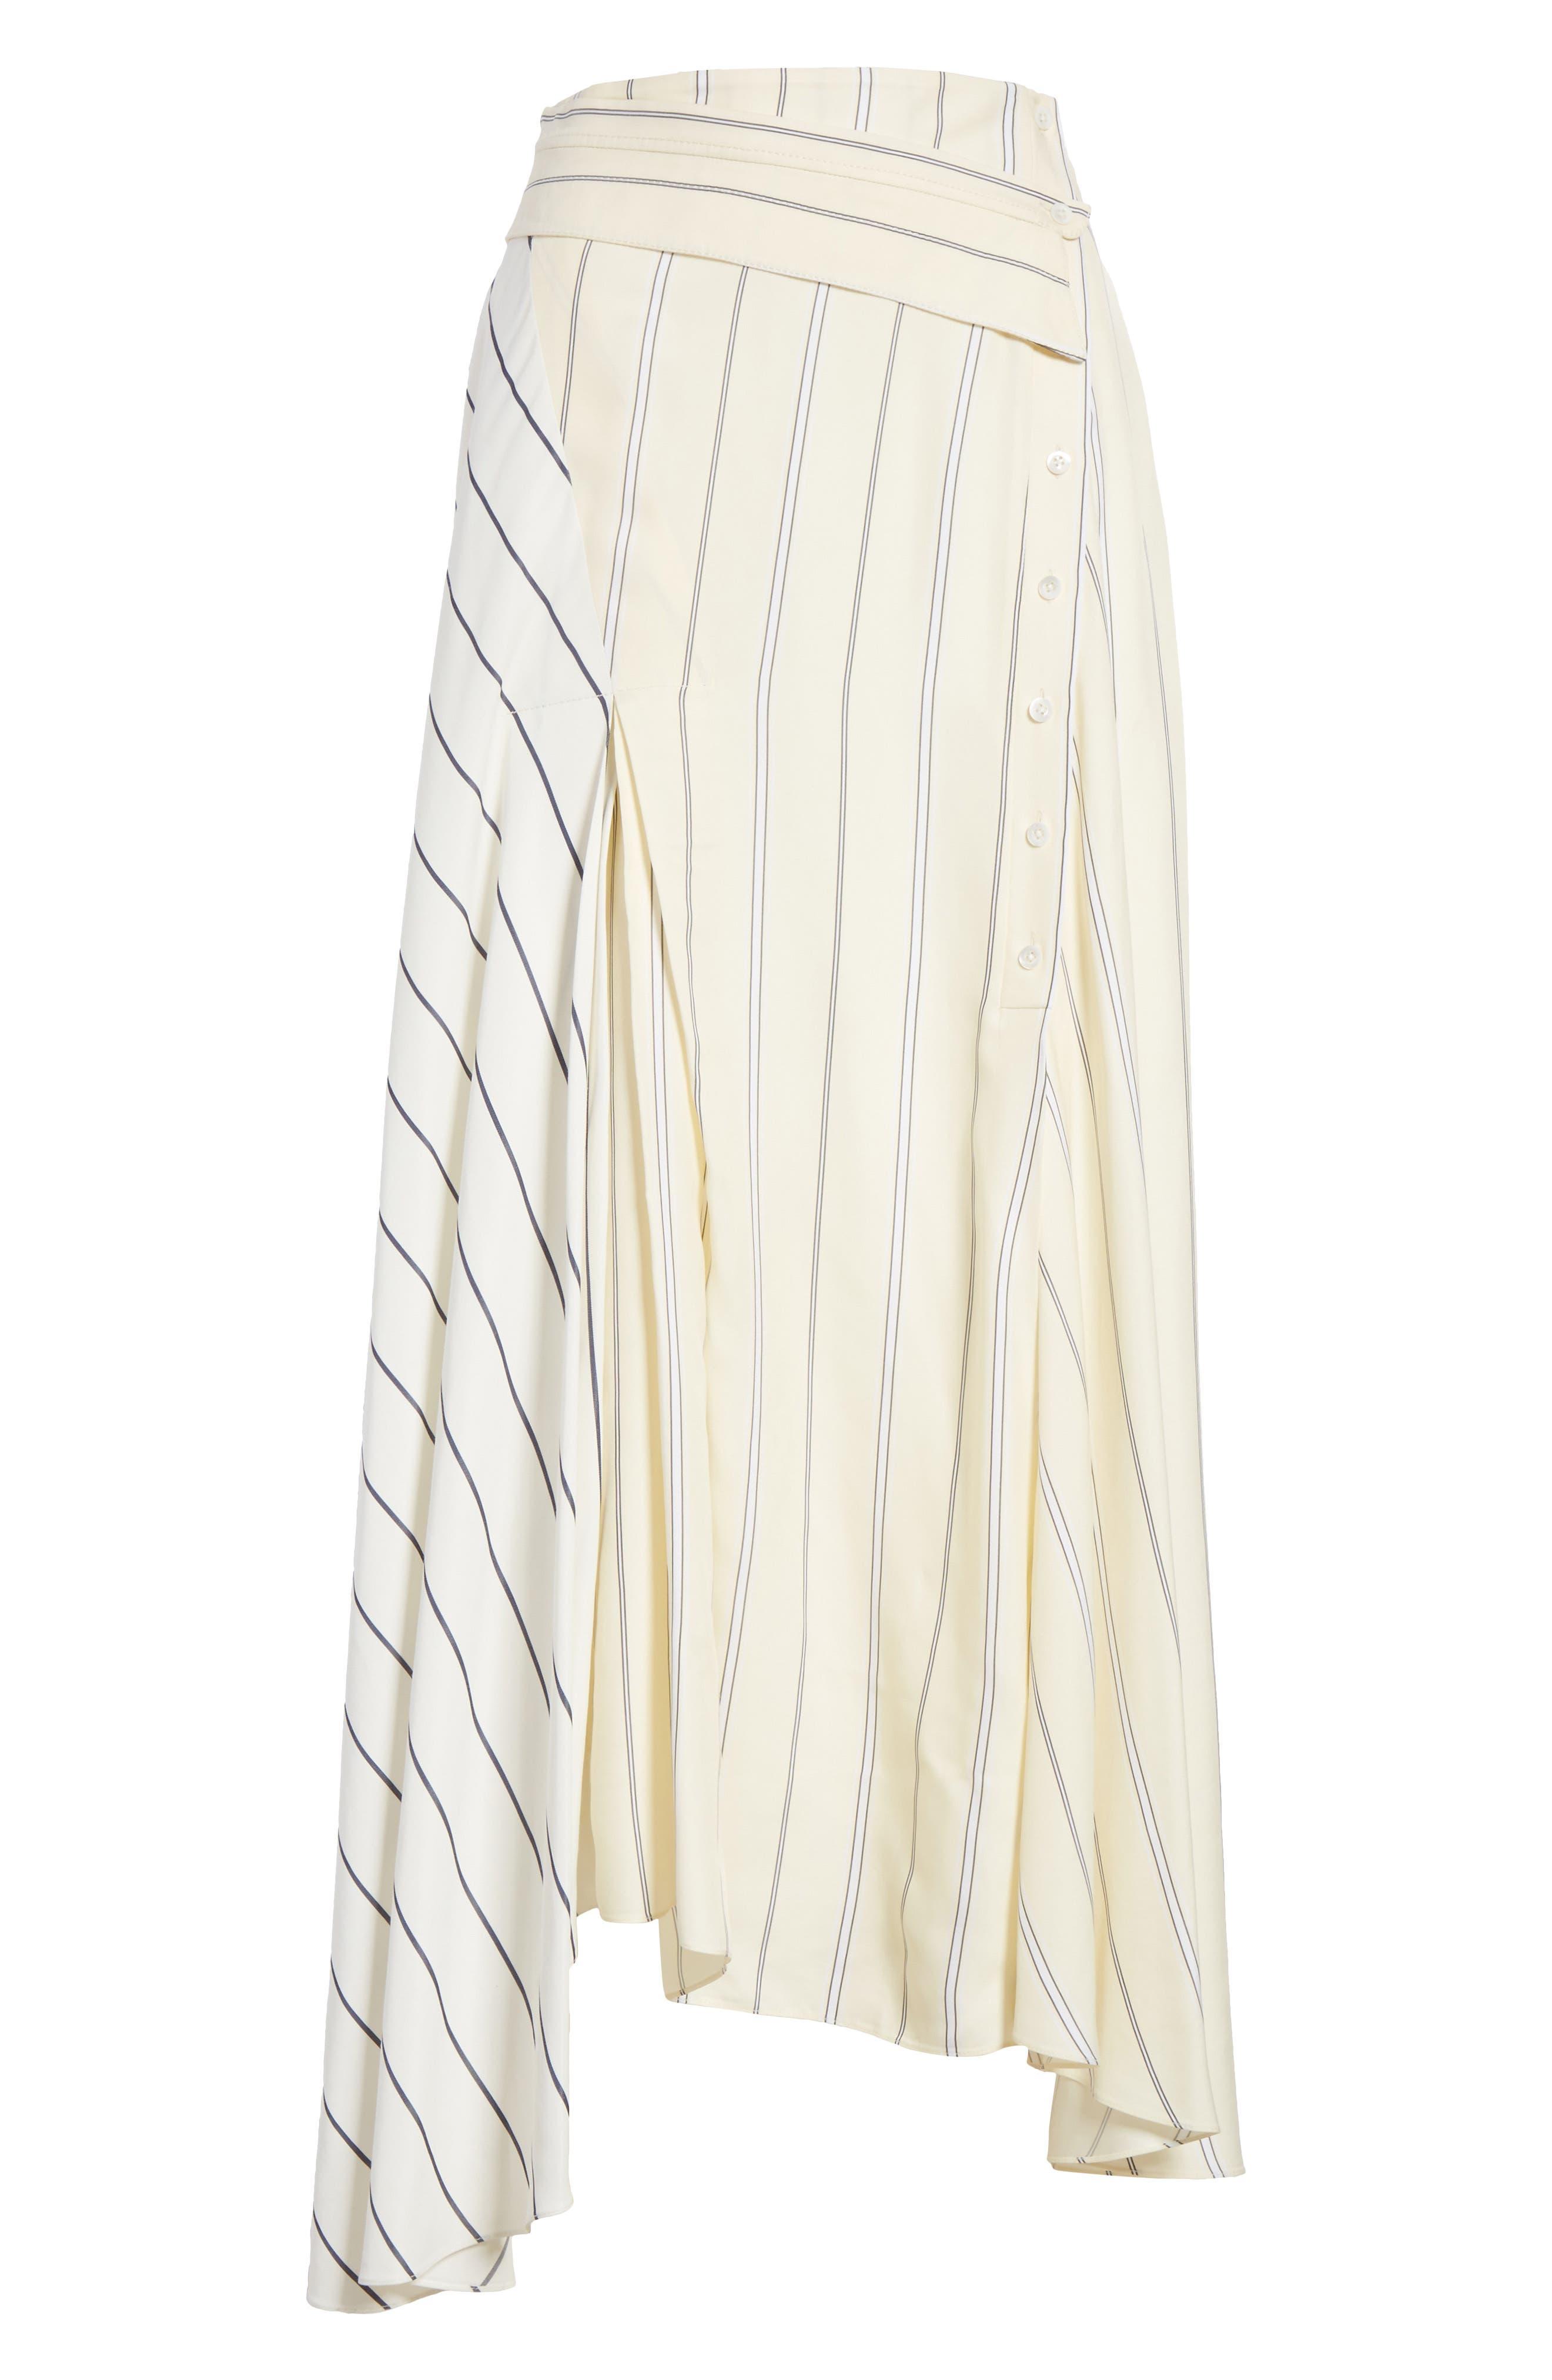 Mixed Stripe Asymmetrical Skirt,                             Alternate thumbnail 6, color,                             Ivory/ Black